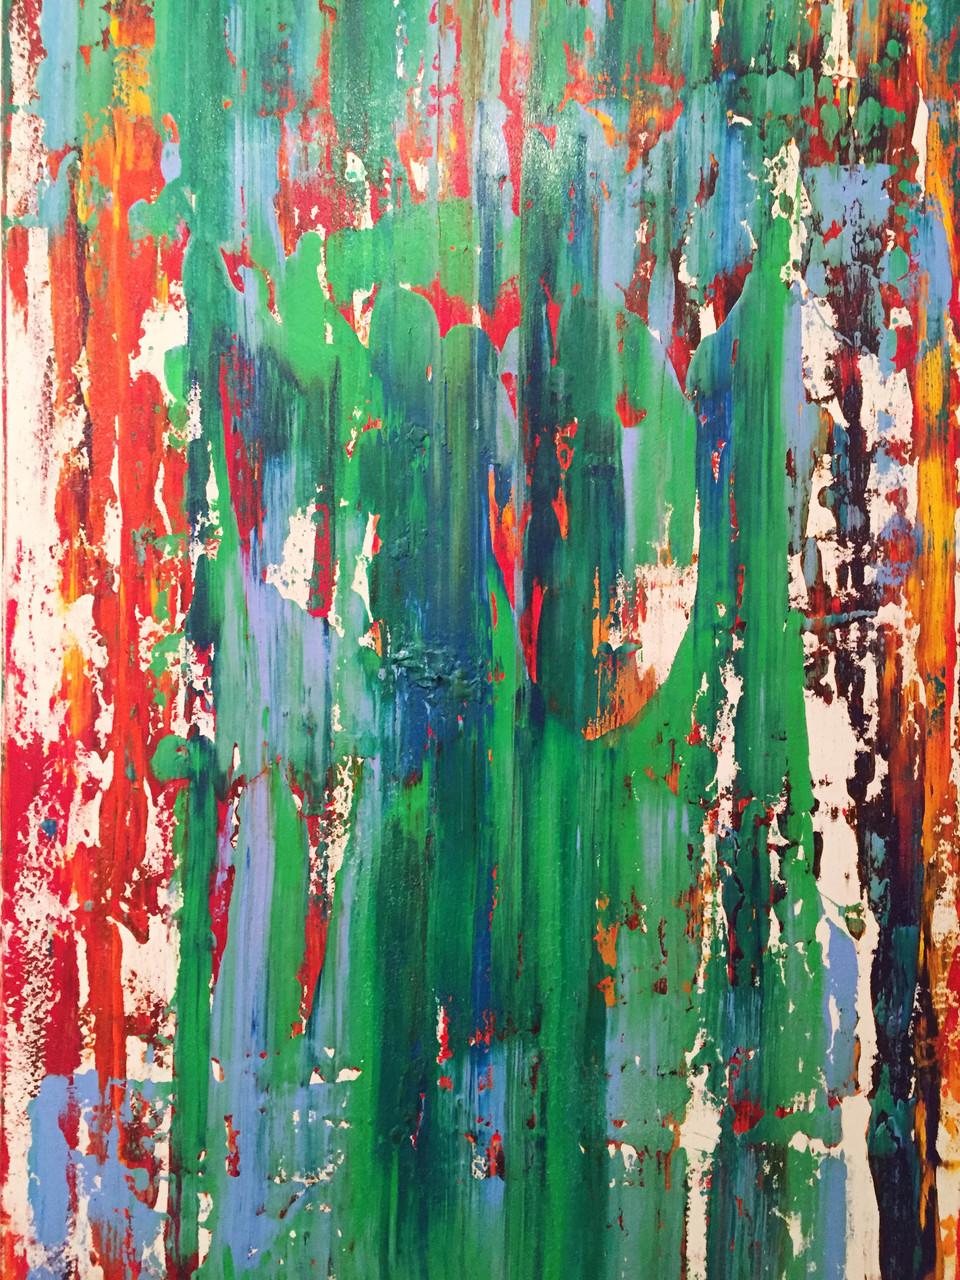 UP&DOWN/Acryl auf Leinwand 100 x 150